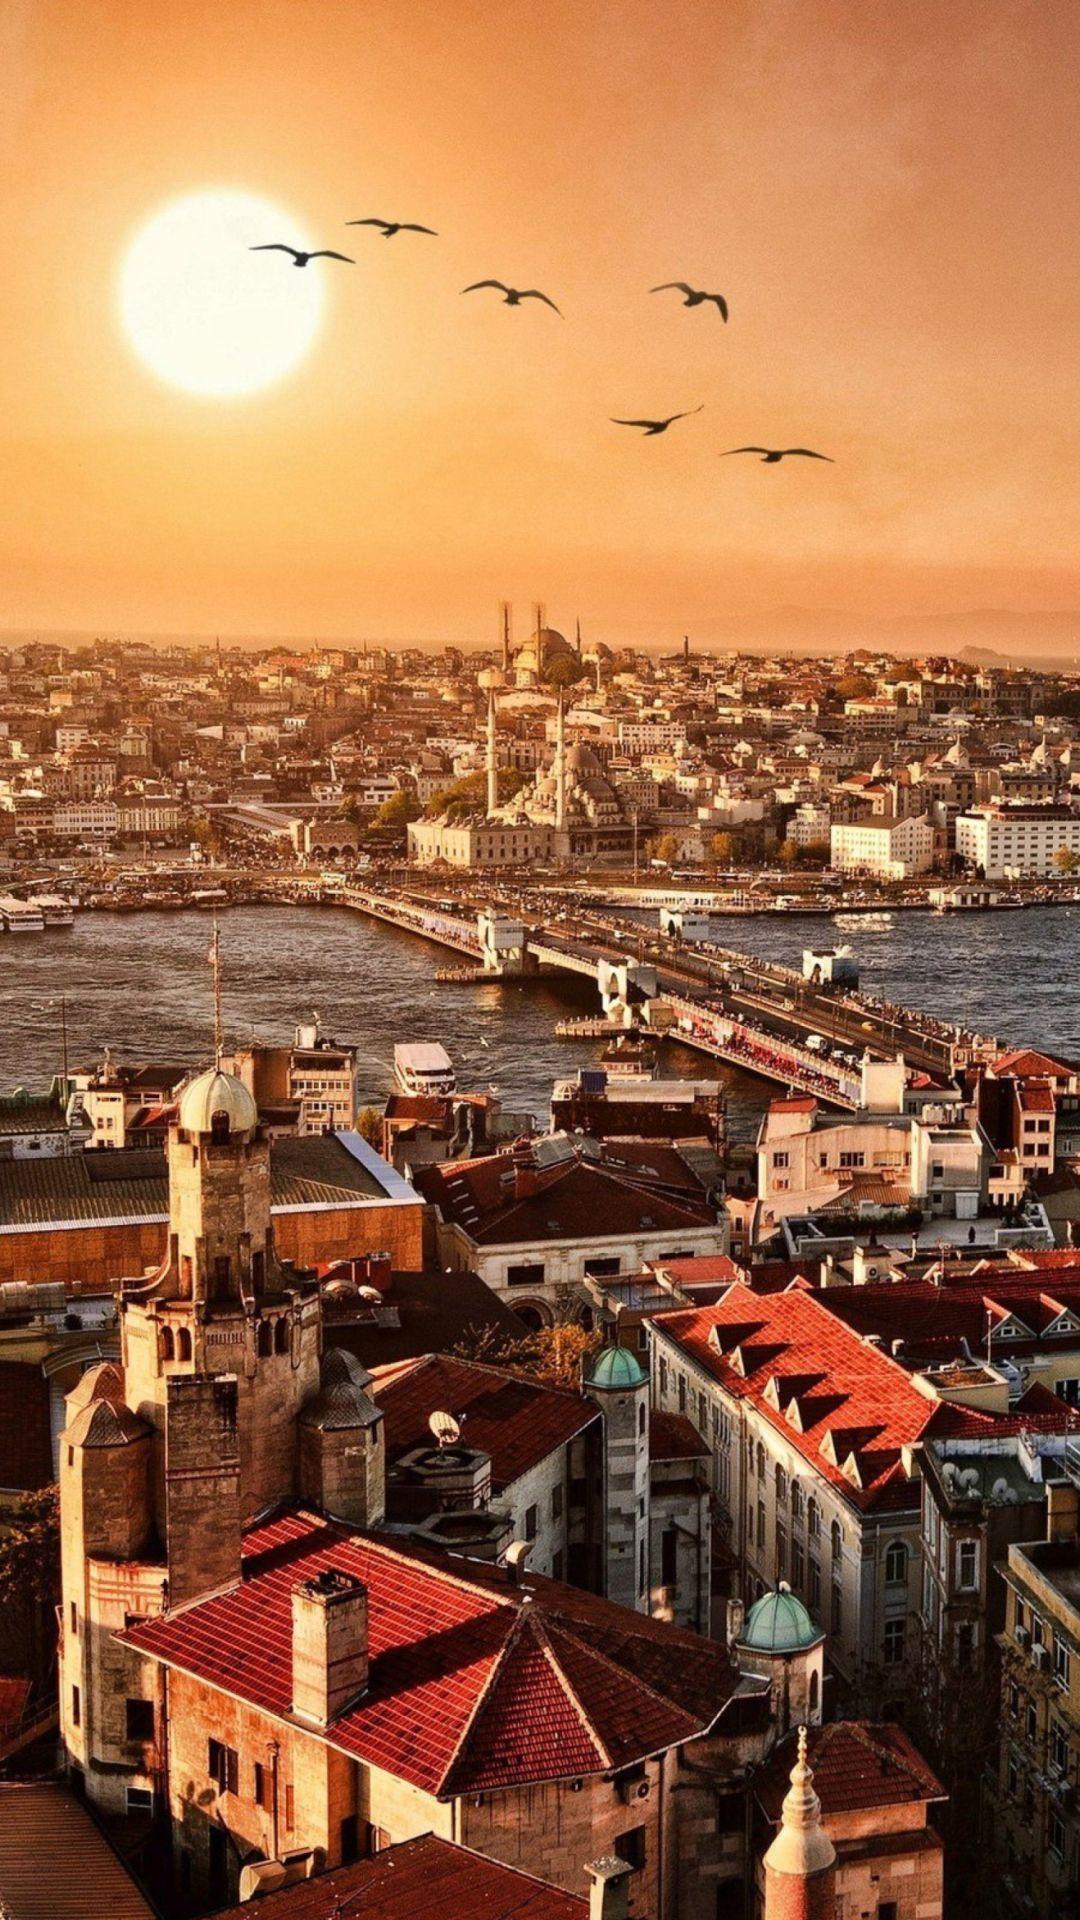 Istanbul Hd Wallpaper Istanbul Wallpapers Wallpaper Cave